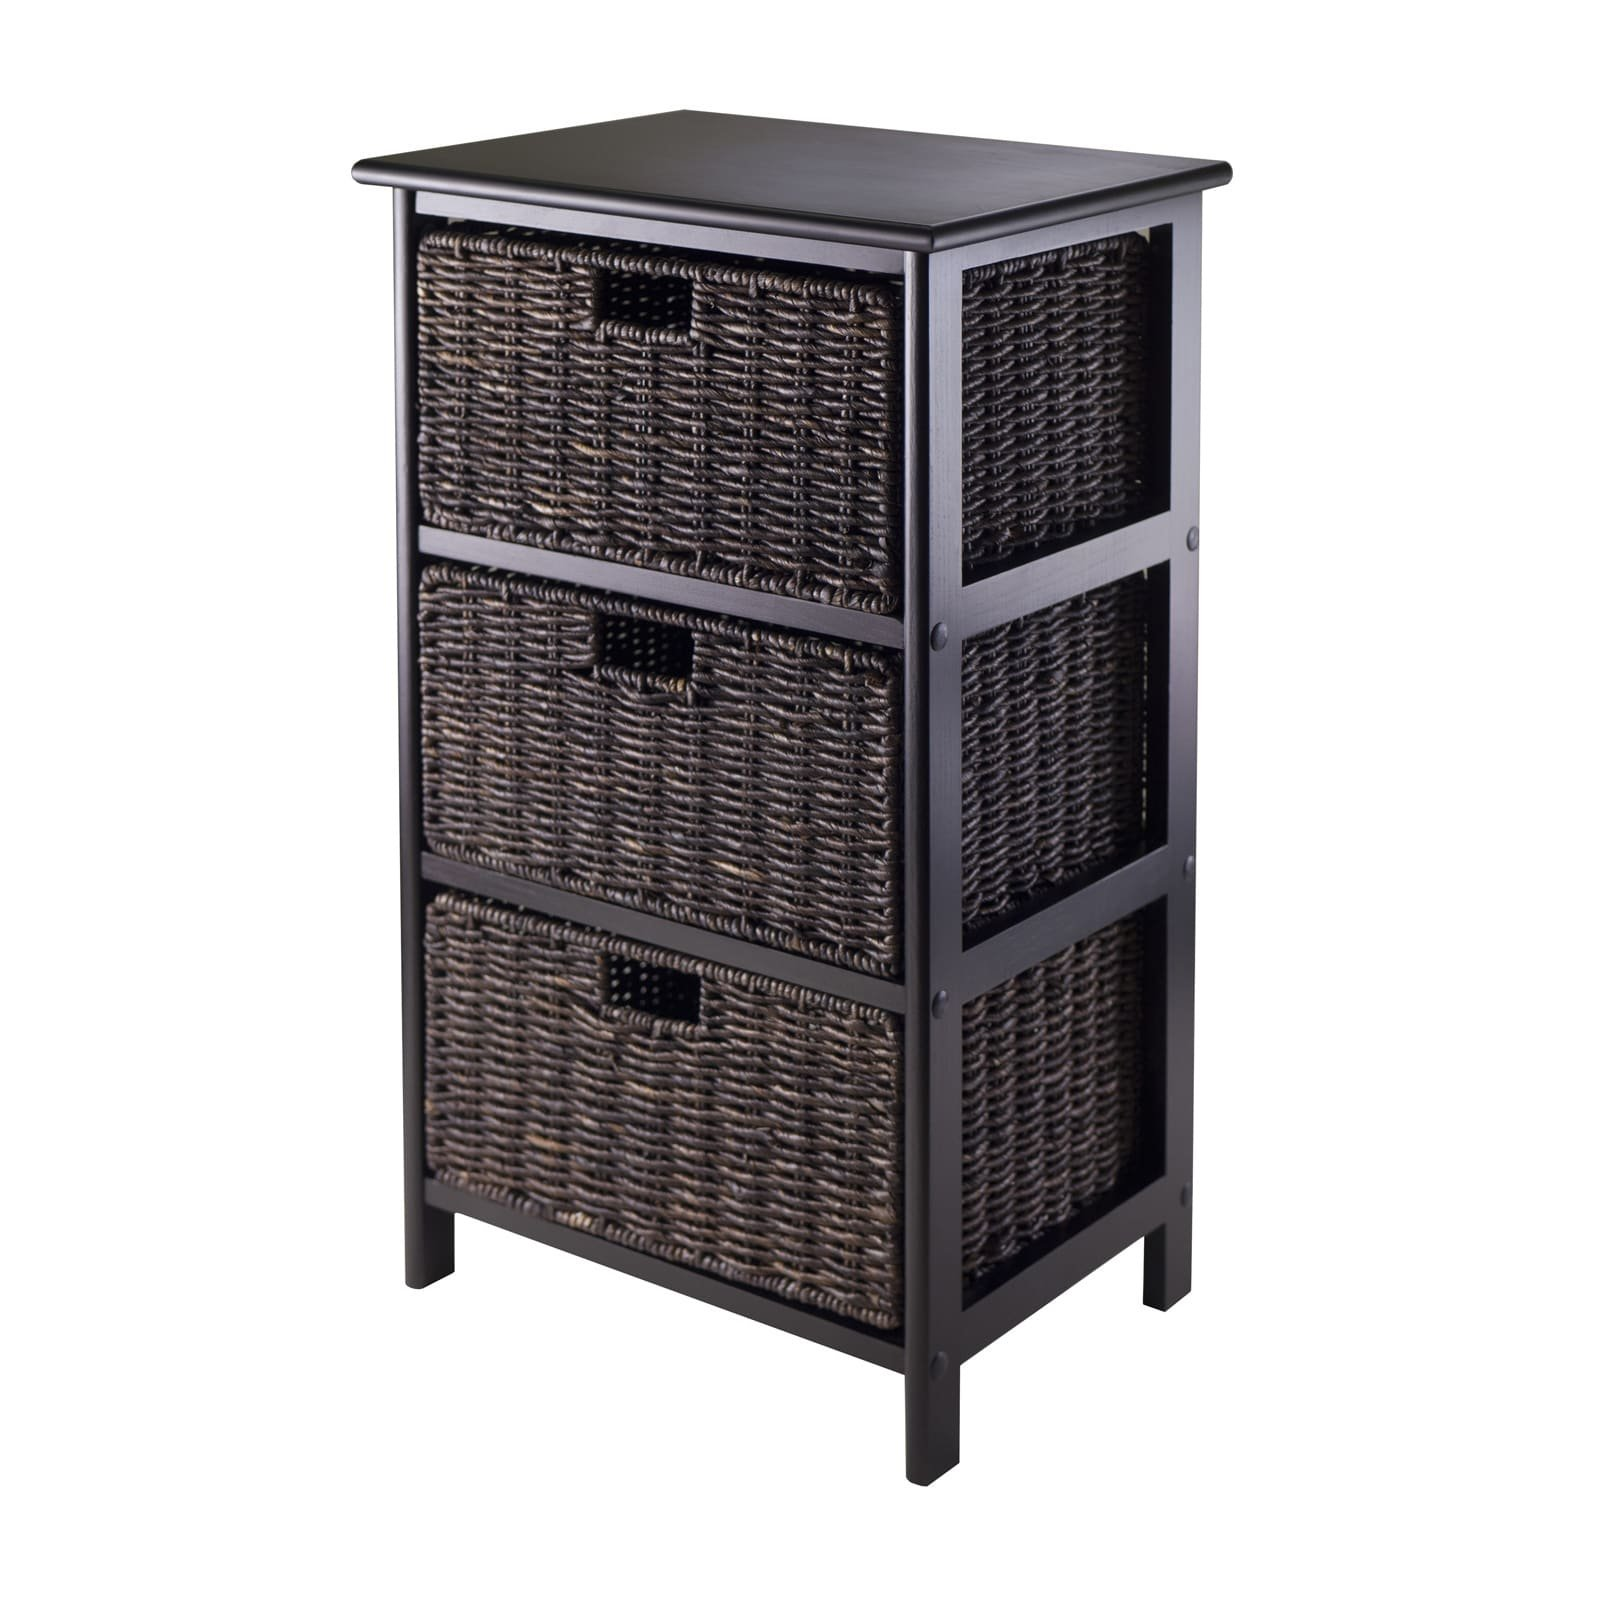 Luxury Home Omaha Brown Wood Three Foldable Baskets Storage Rack by Luxury Home (Image #1)